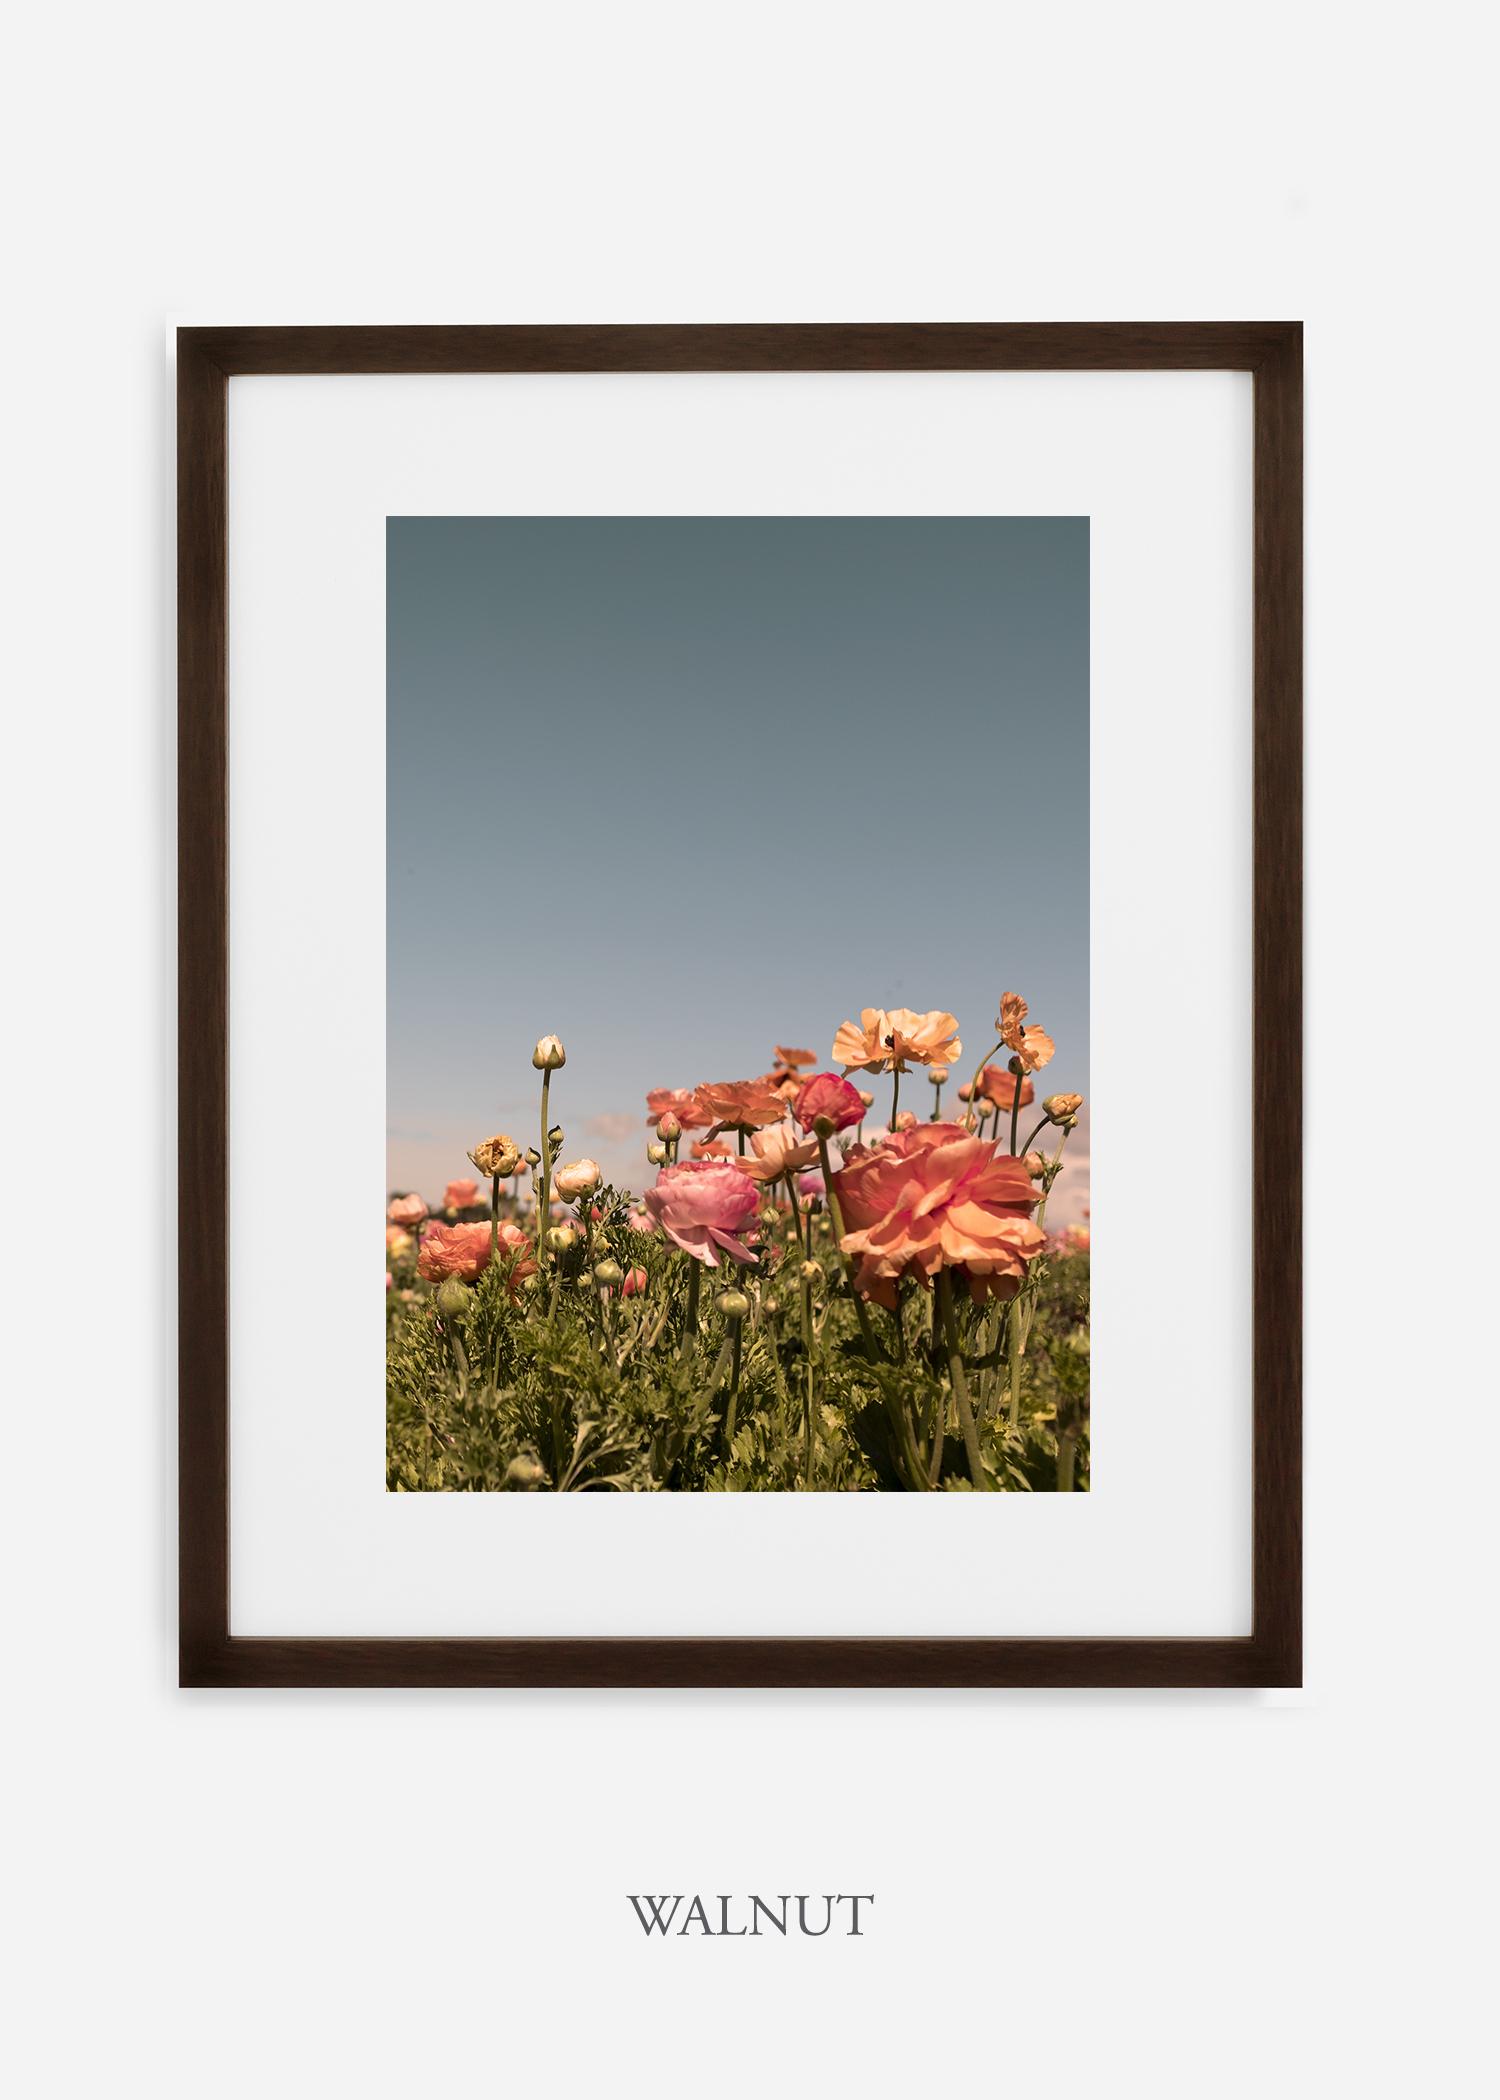 FloraNo.1-dark-walnut-frame_mat-interiordesign-botanicalprint-art.jpg